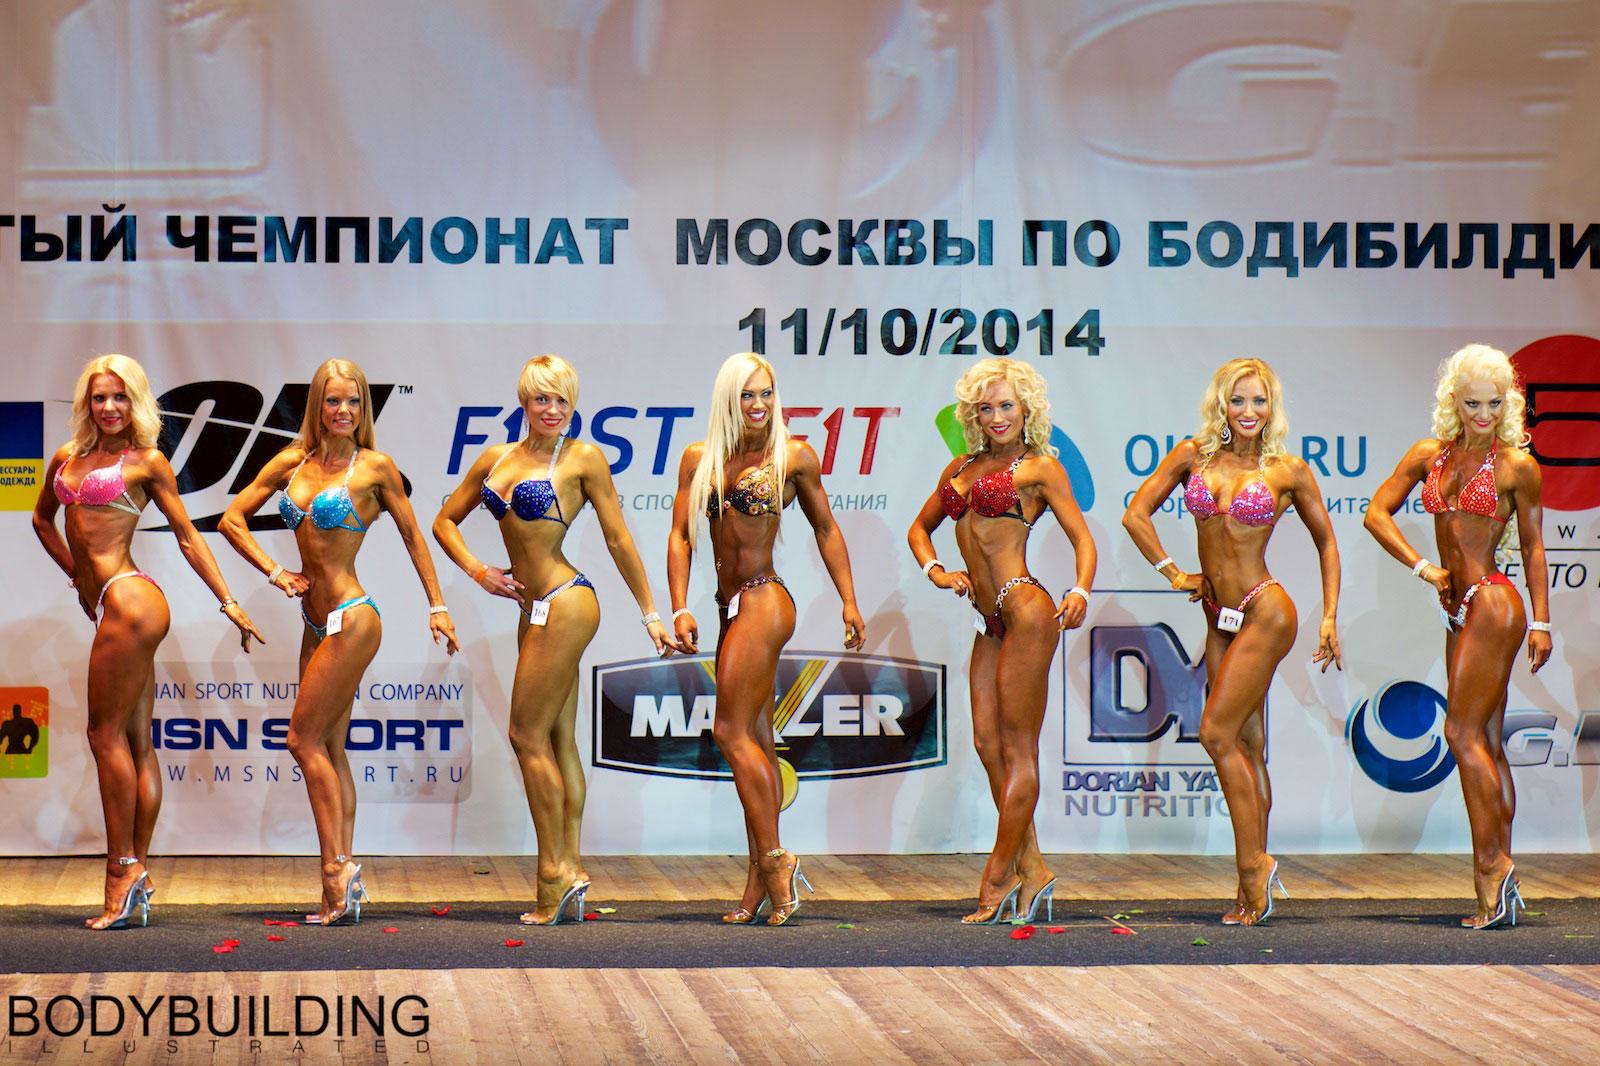 Чемпионат Москвы по бодибилдингу 11.10.2014